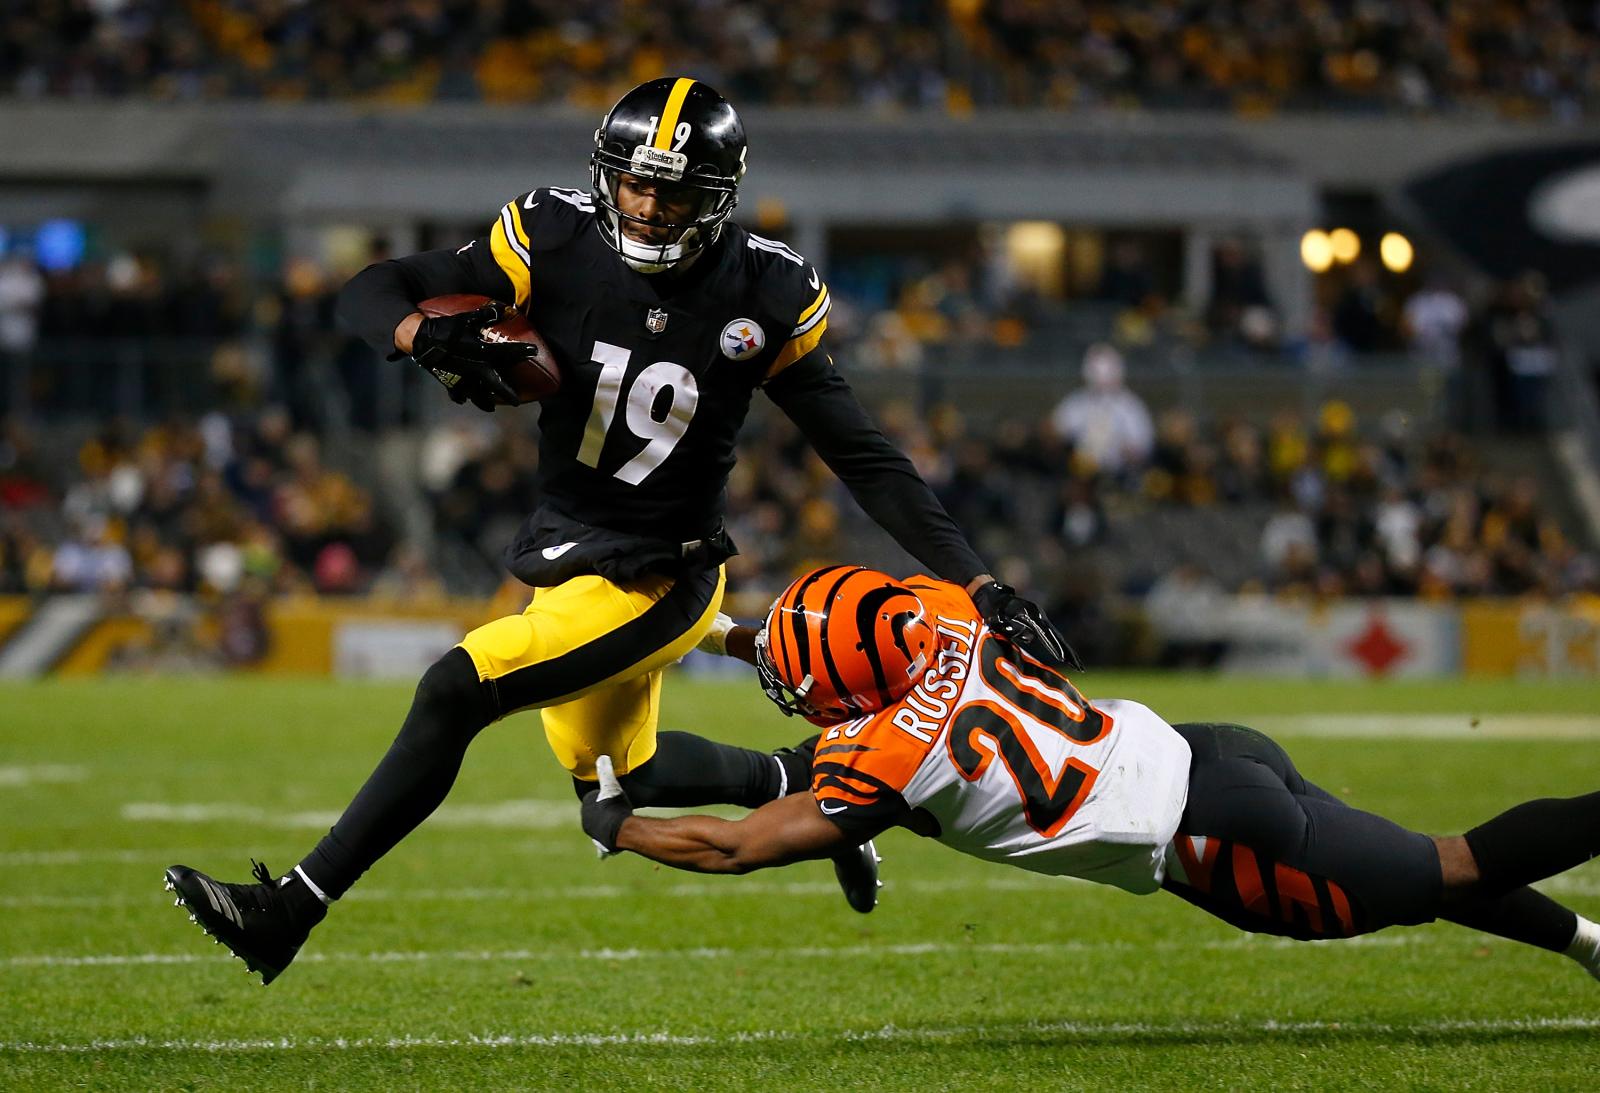 2020 NFL Draft: Pittsburgh Steelers 7-round Mock Draft